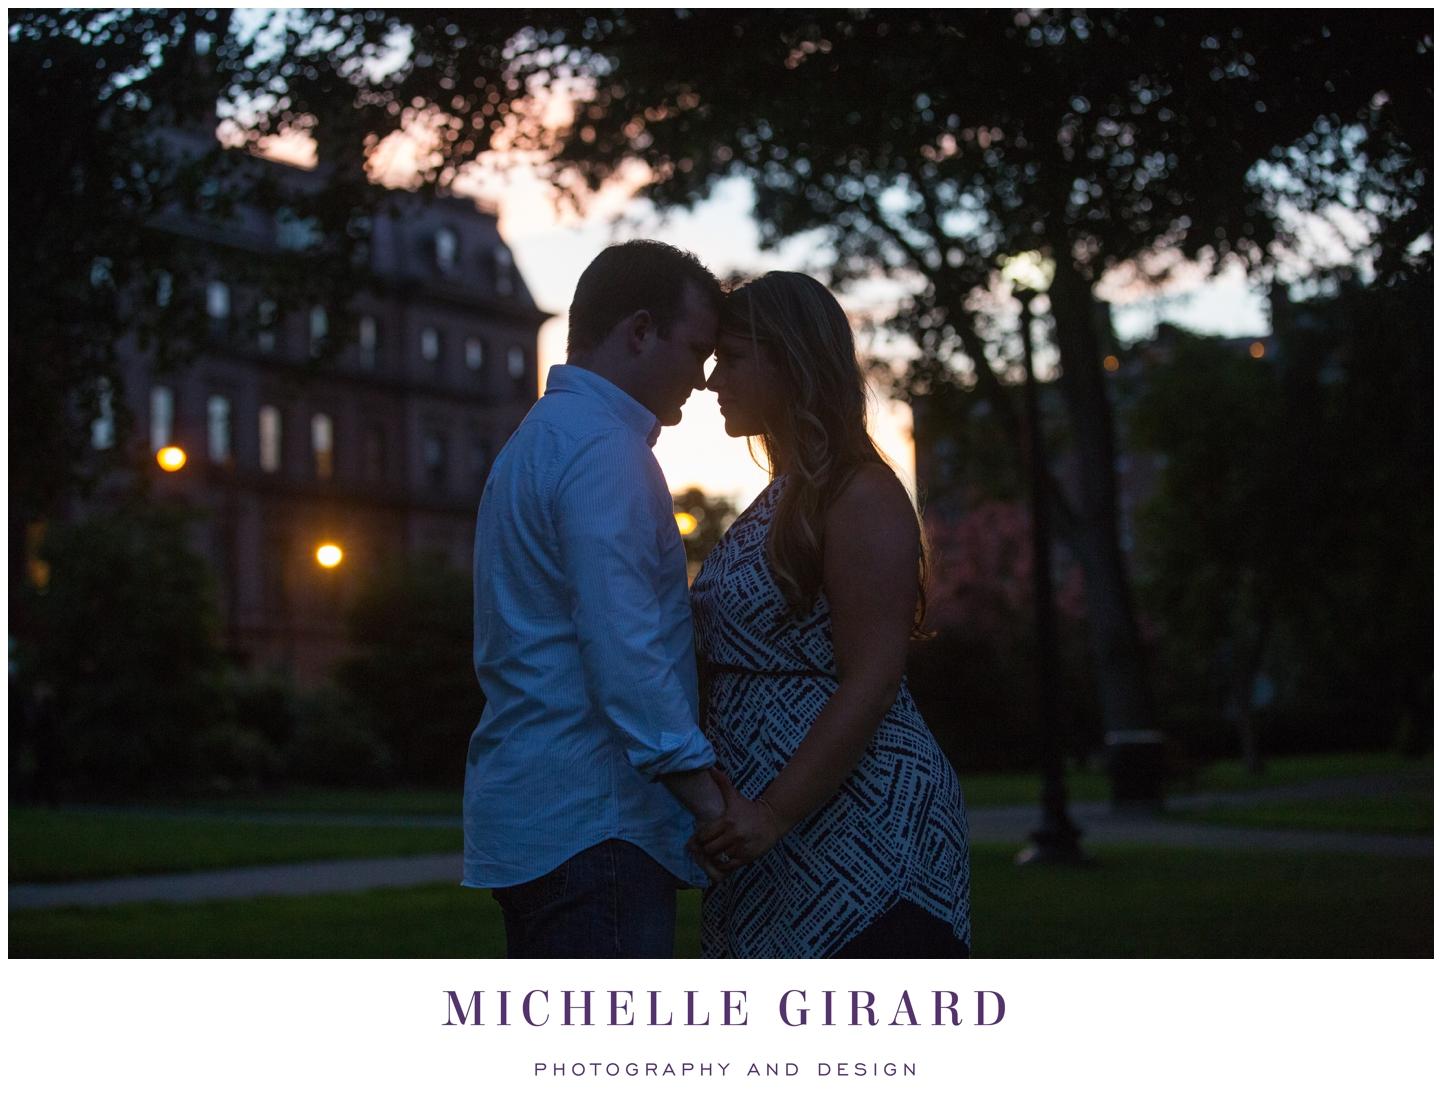 BostonCommonsGardens_BostonEngagementSession_MichelleGirardPhotography06.jpg